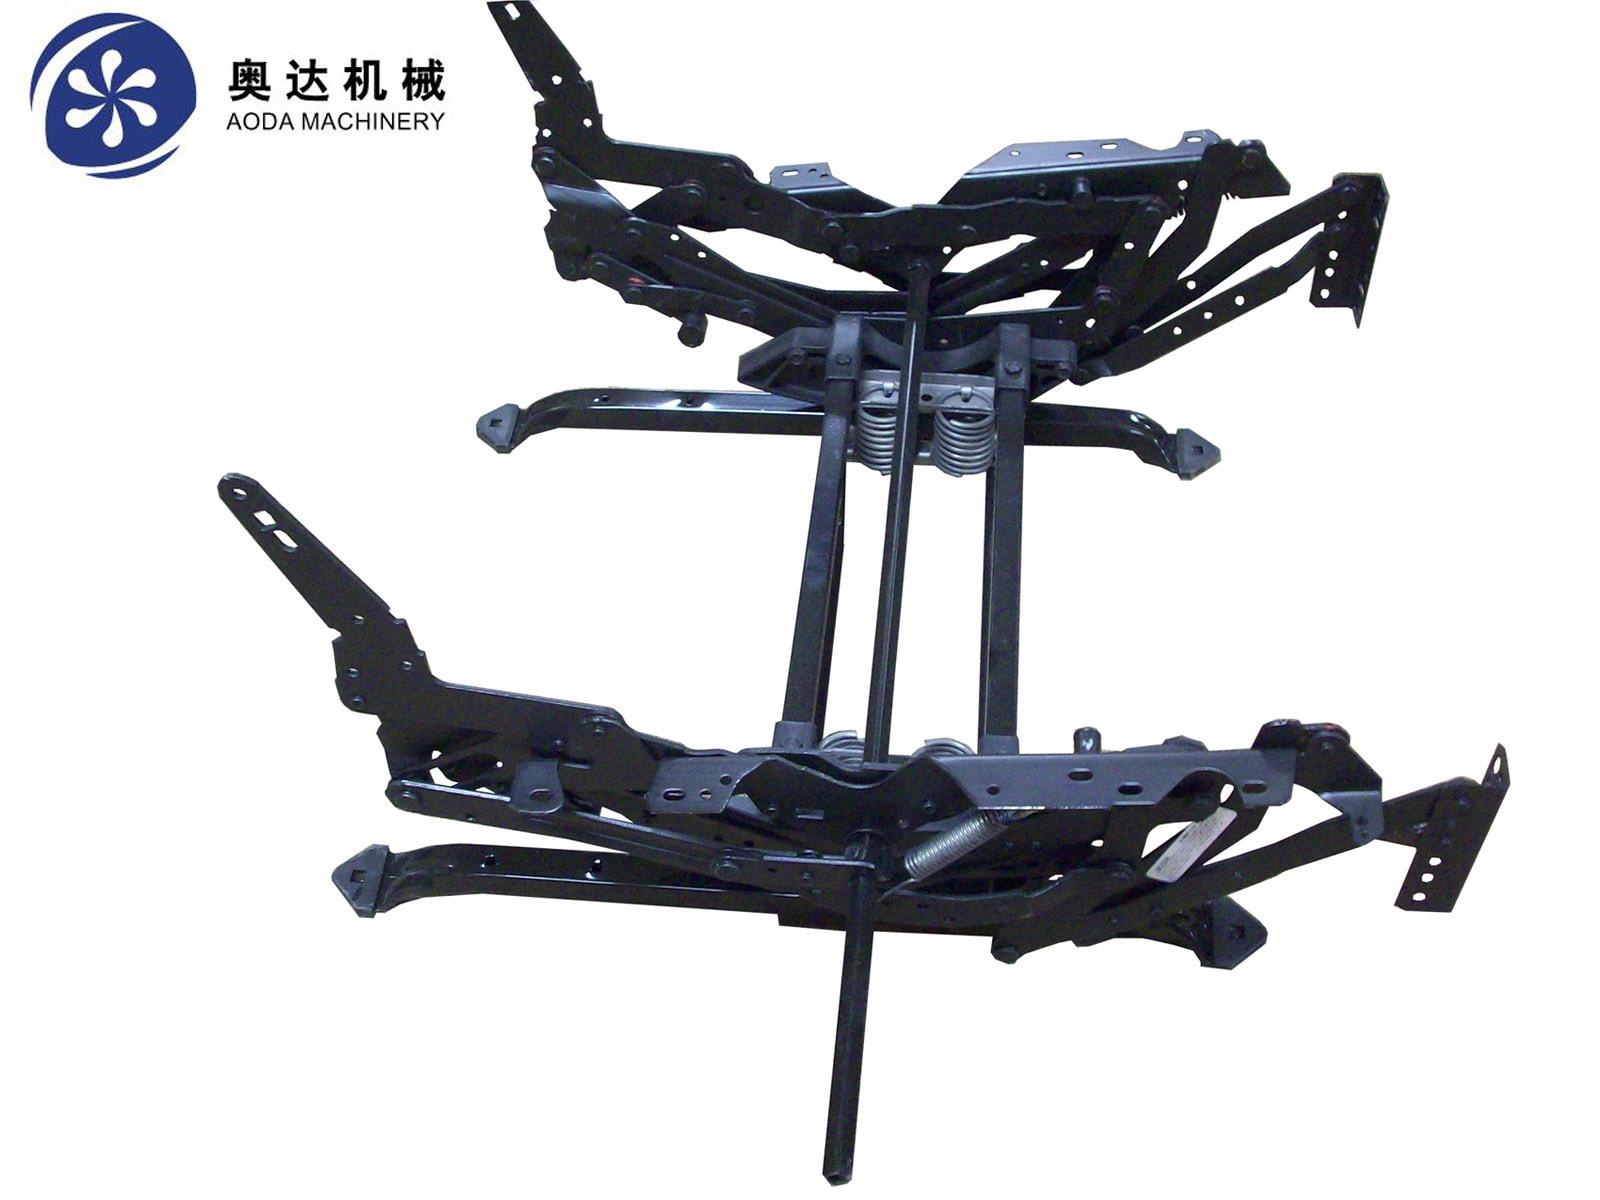 China Rocker Recliner Mechanism Ad4183 China Recliner Mechanism Sofa Recliner Mechanism